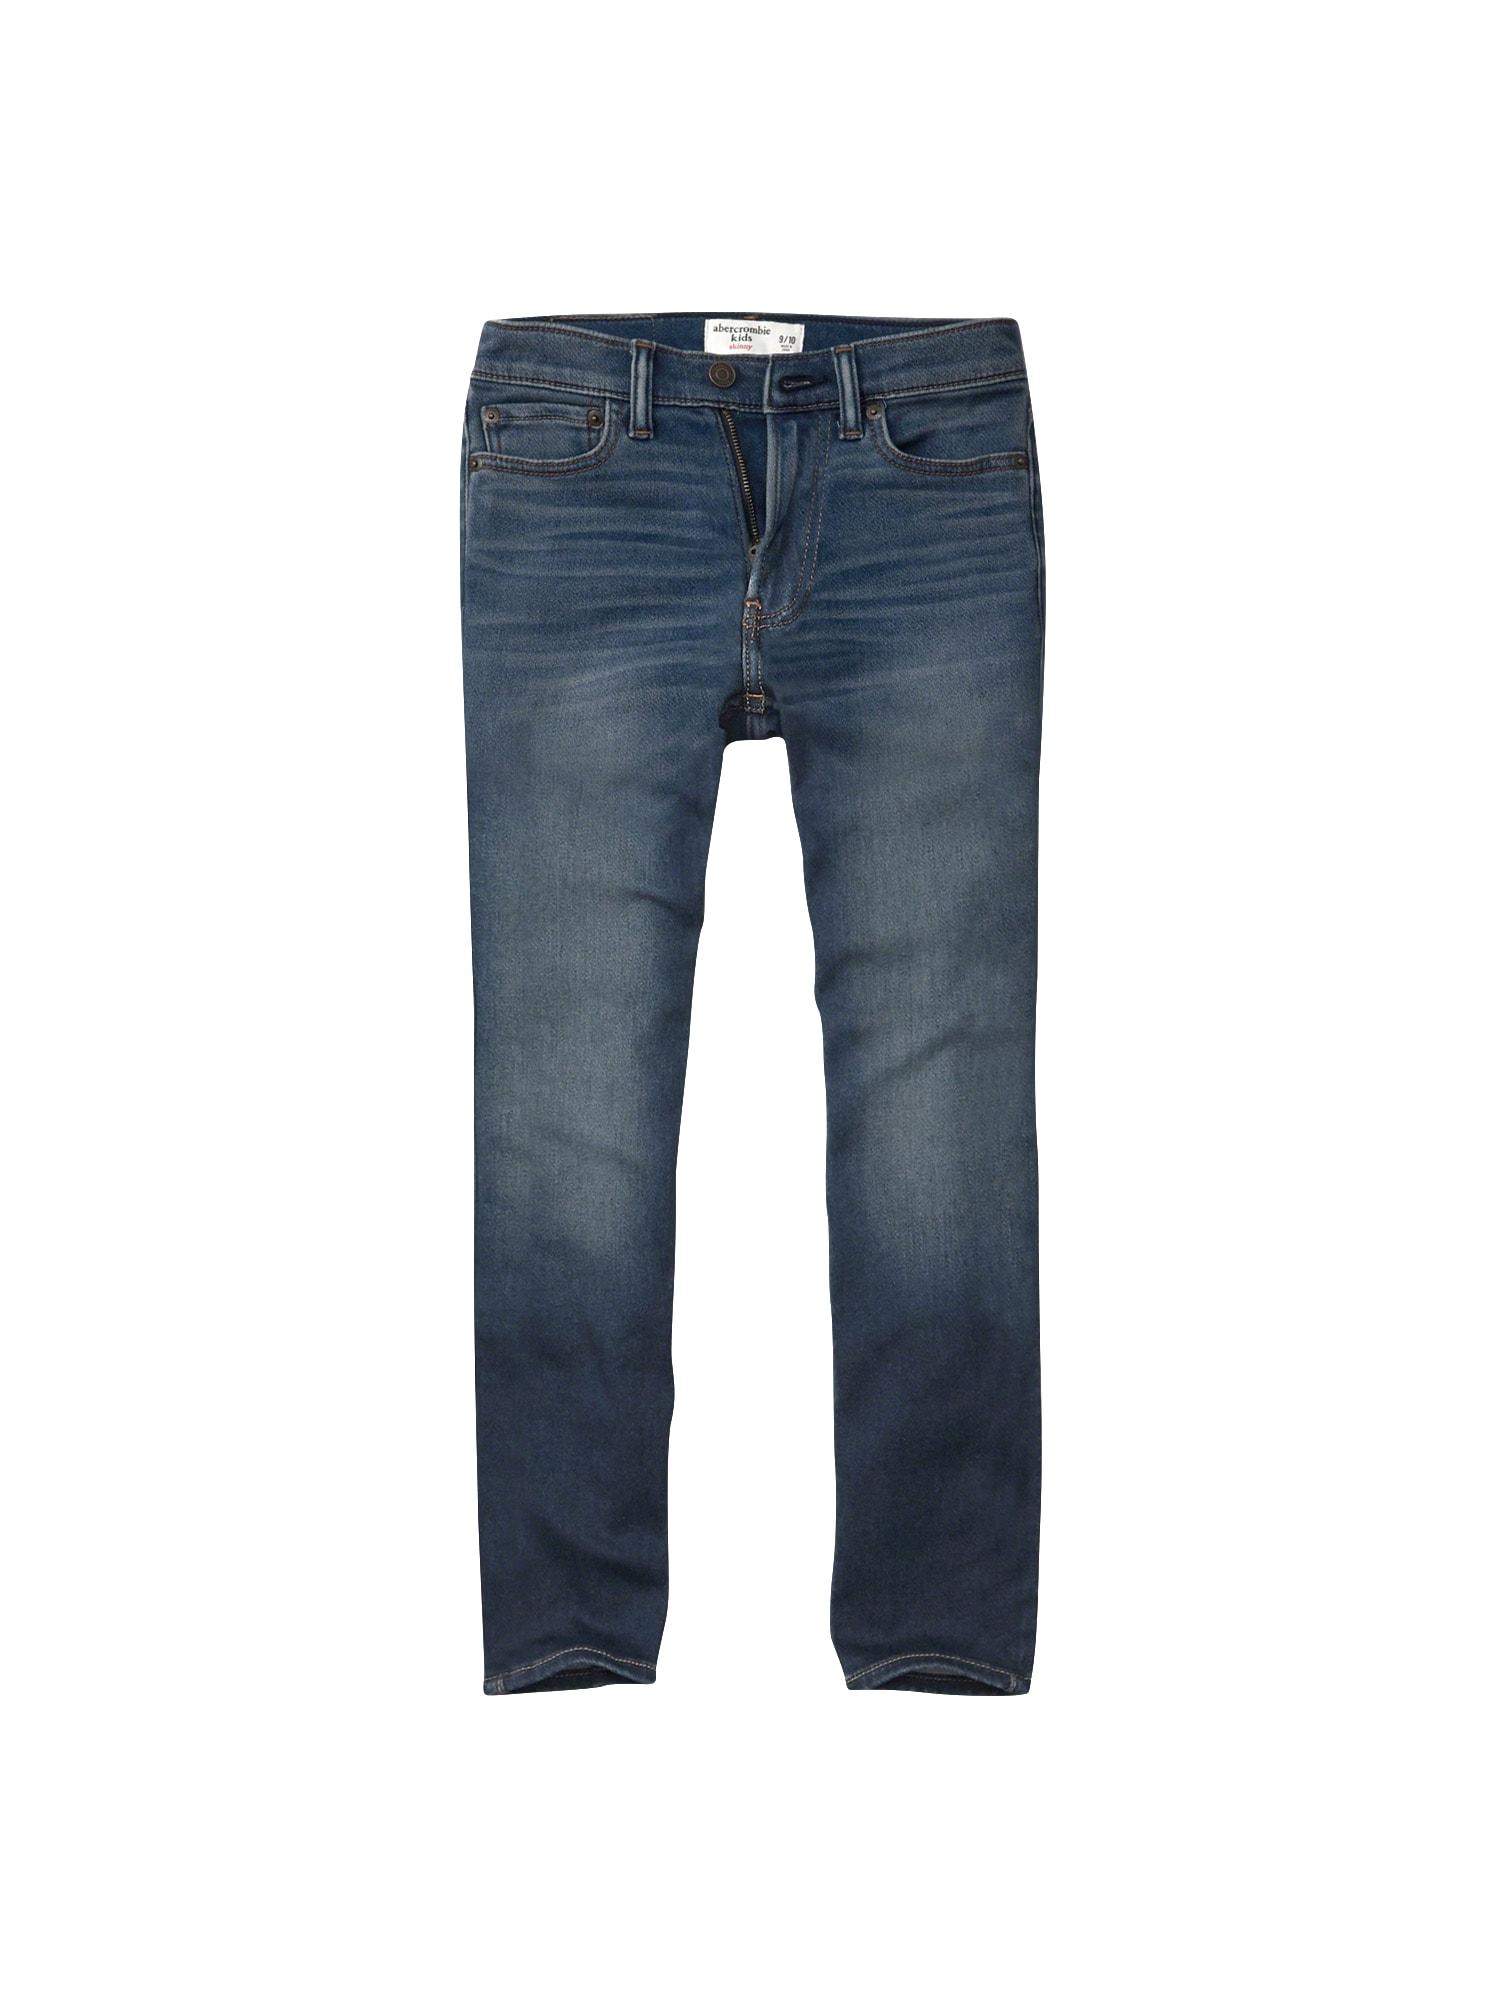 Abercrombie & Fitch Džinsai tamsiai (džinso) mėlyna